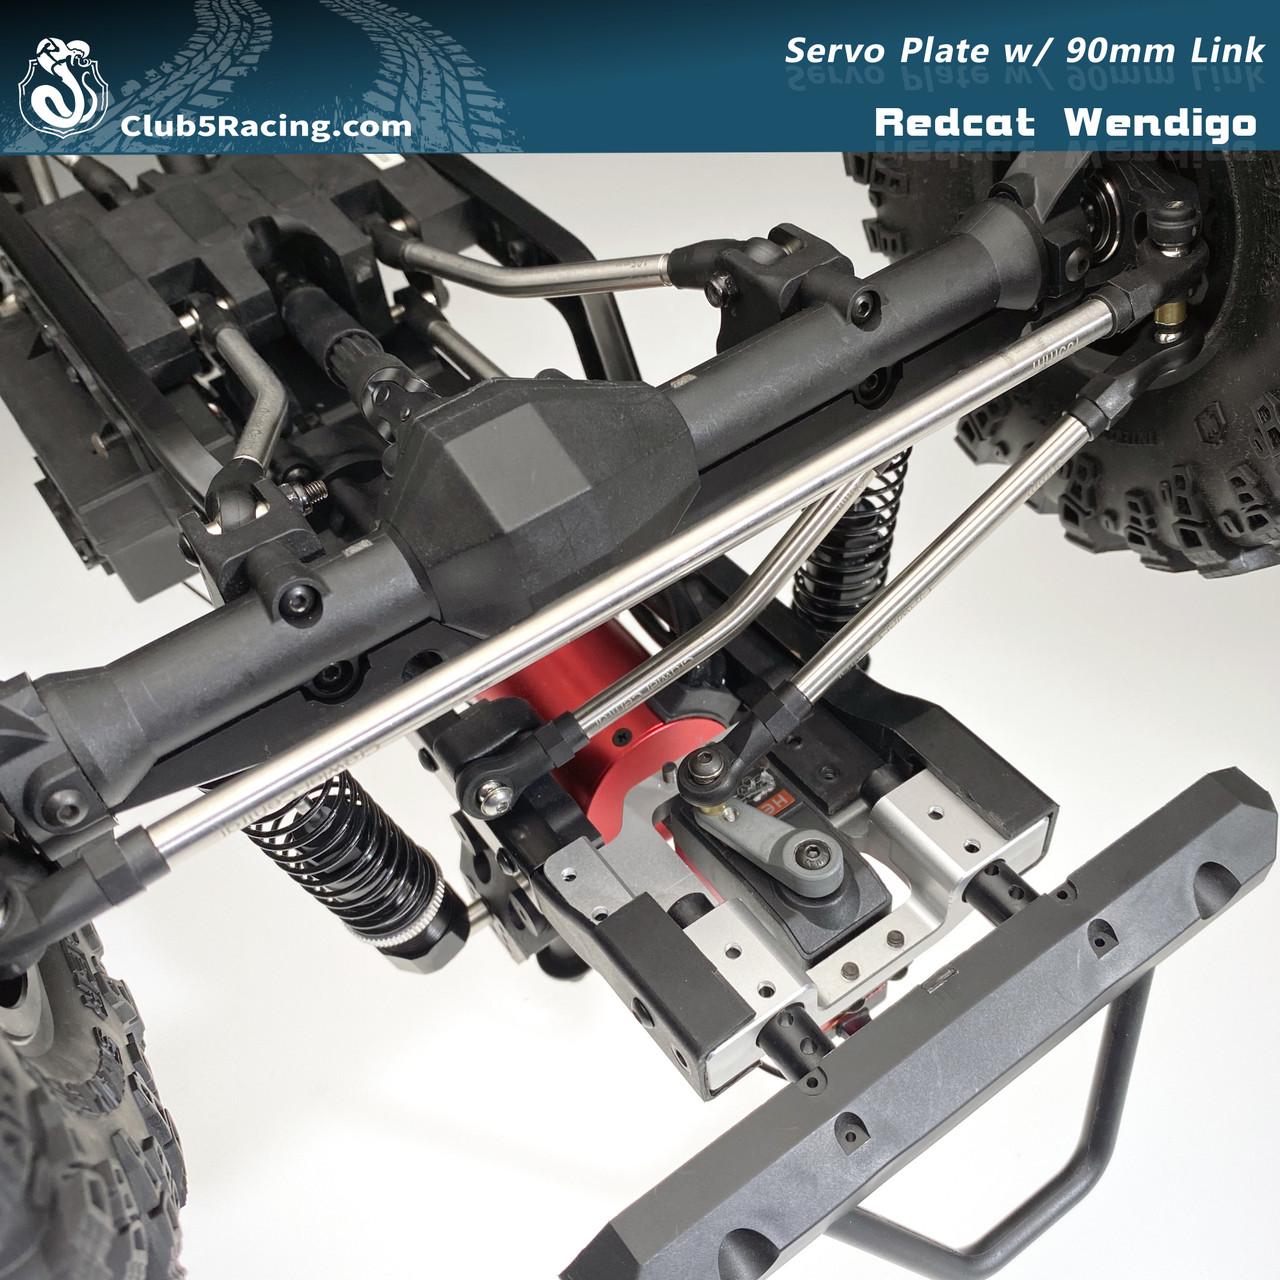 Aluminum Servo Relocation / Front Bumper Mount for Redcat Wendigo